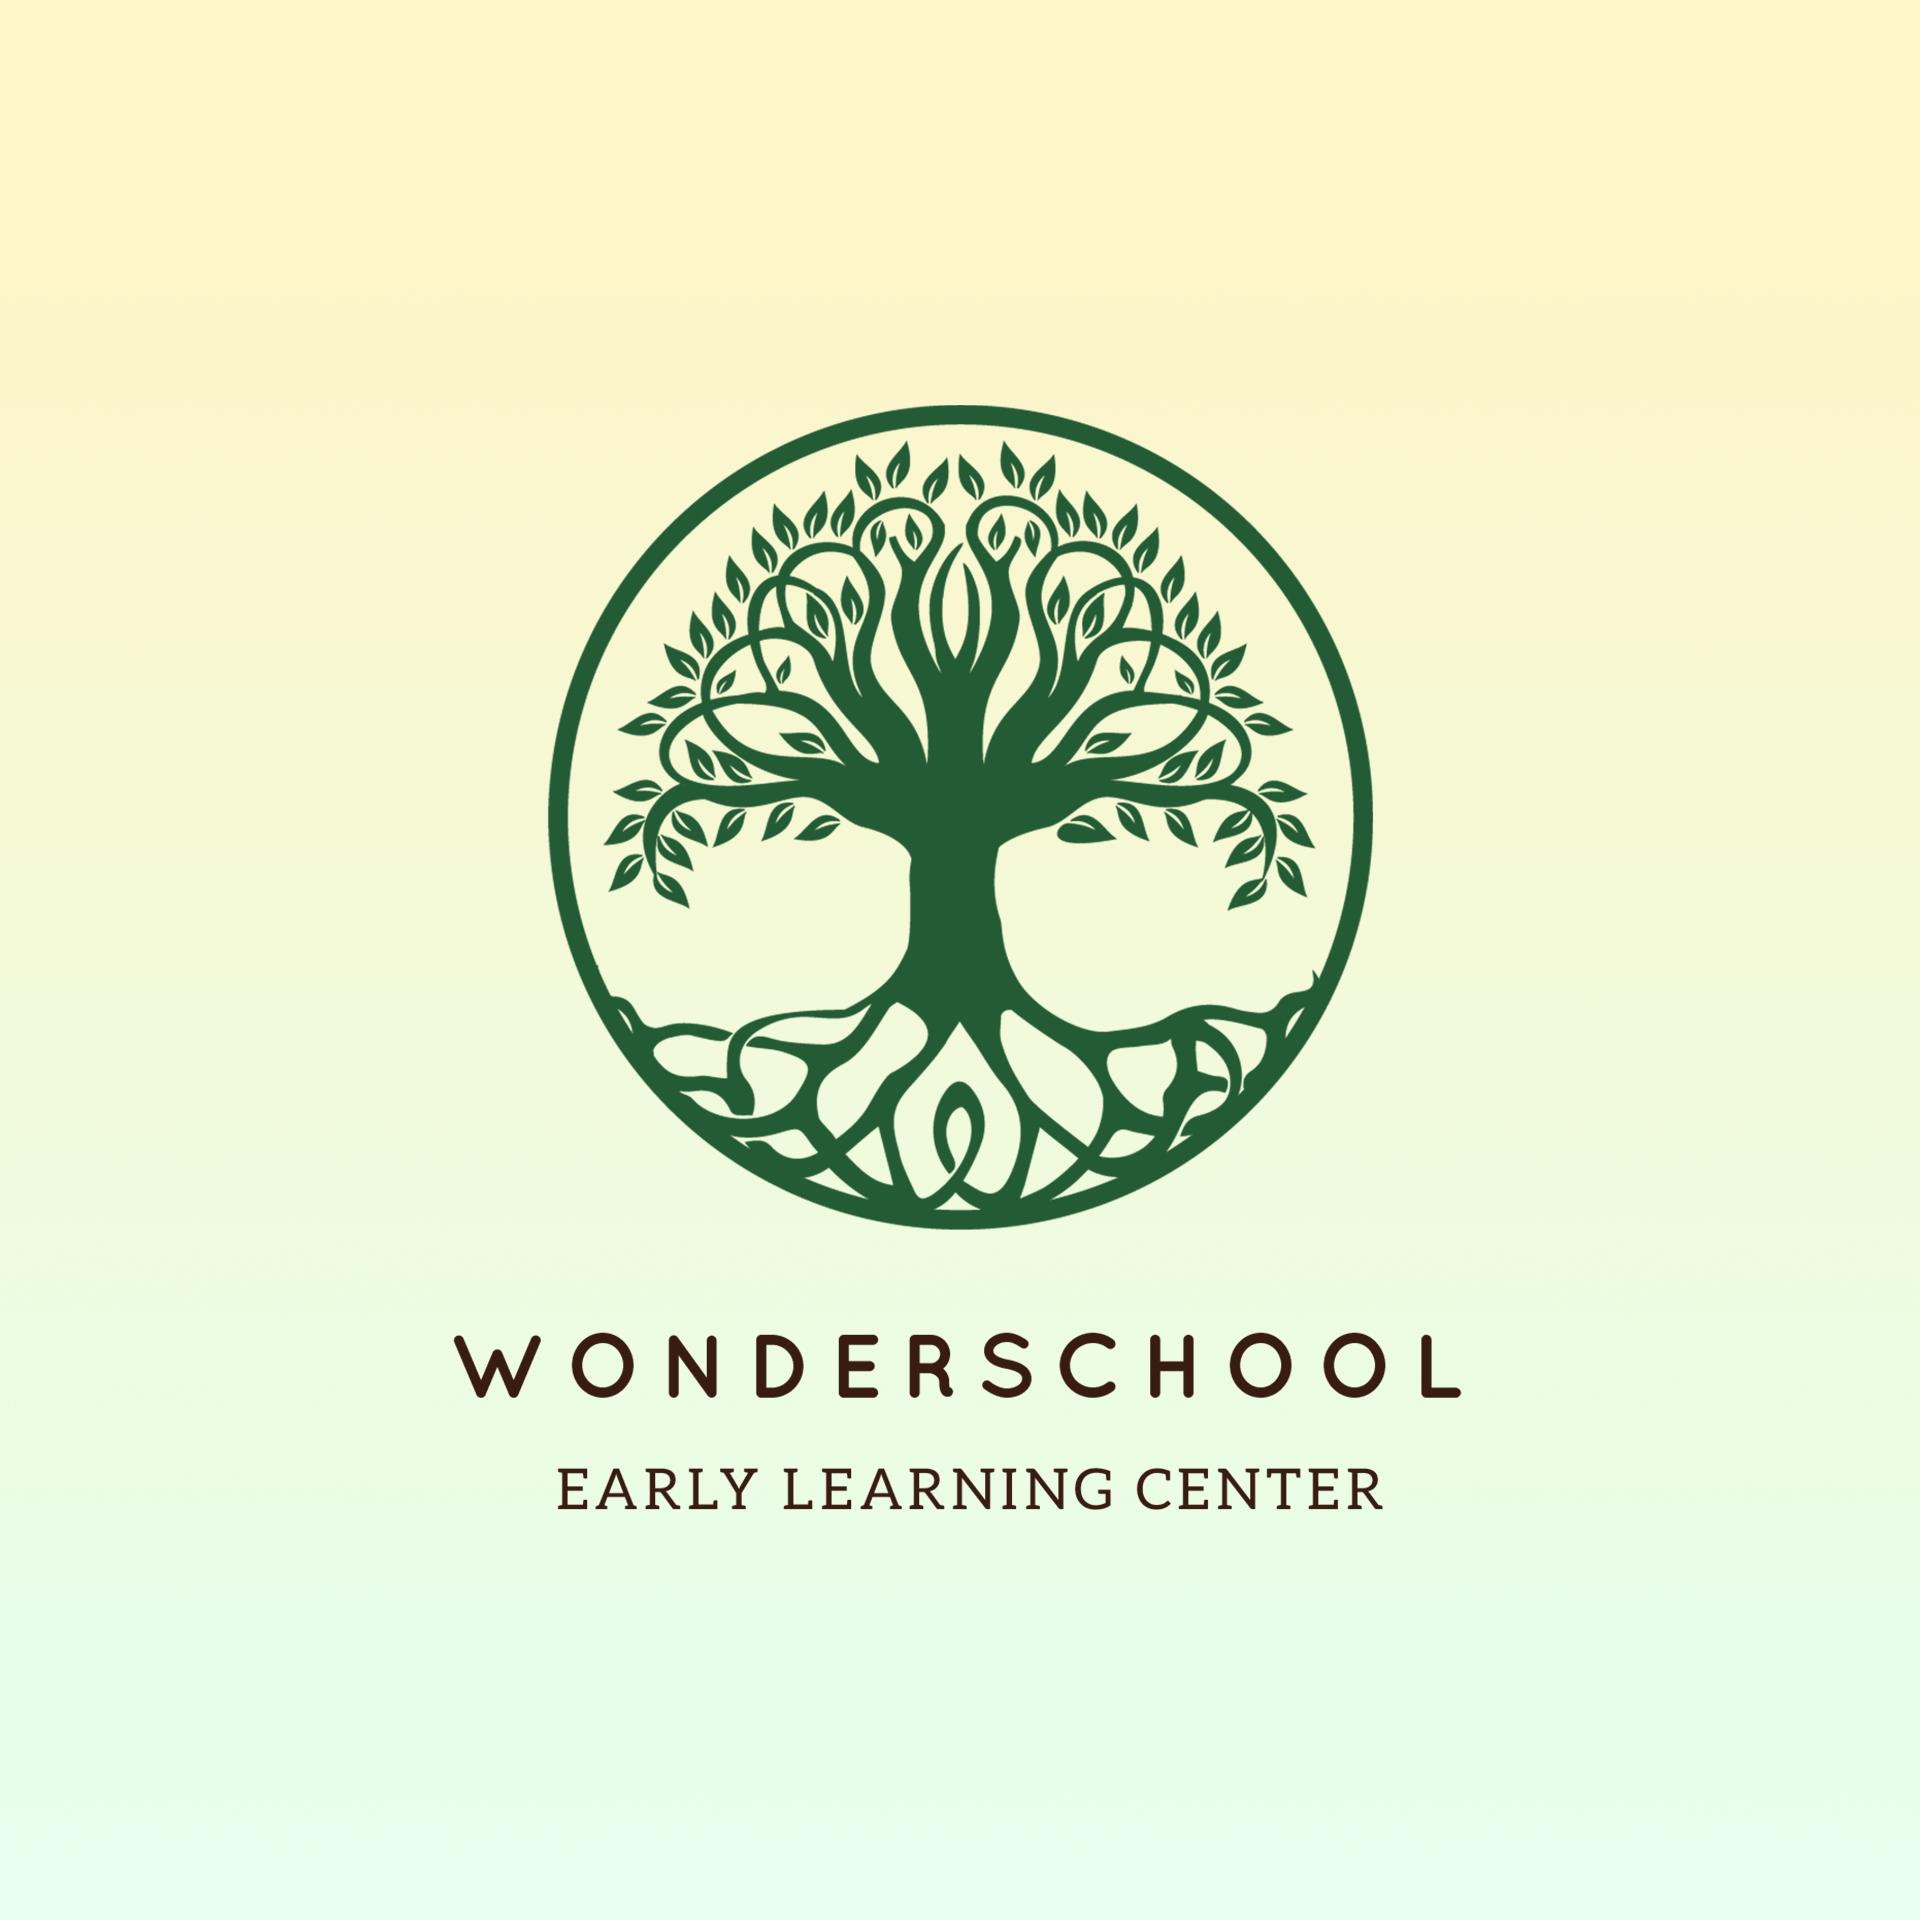 Wonder Share School